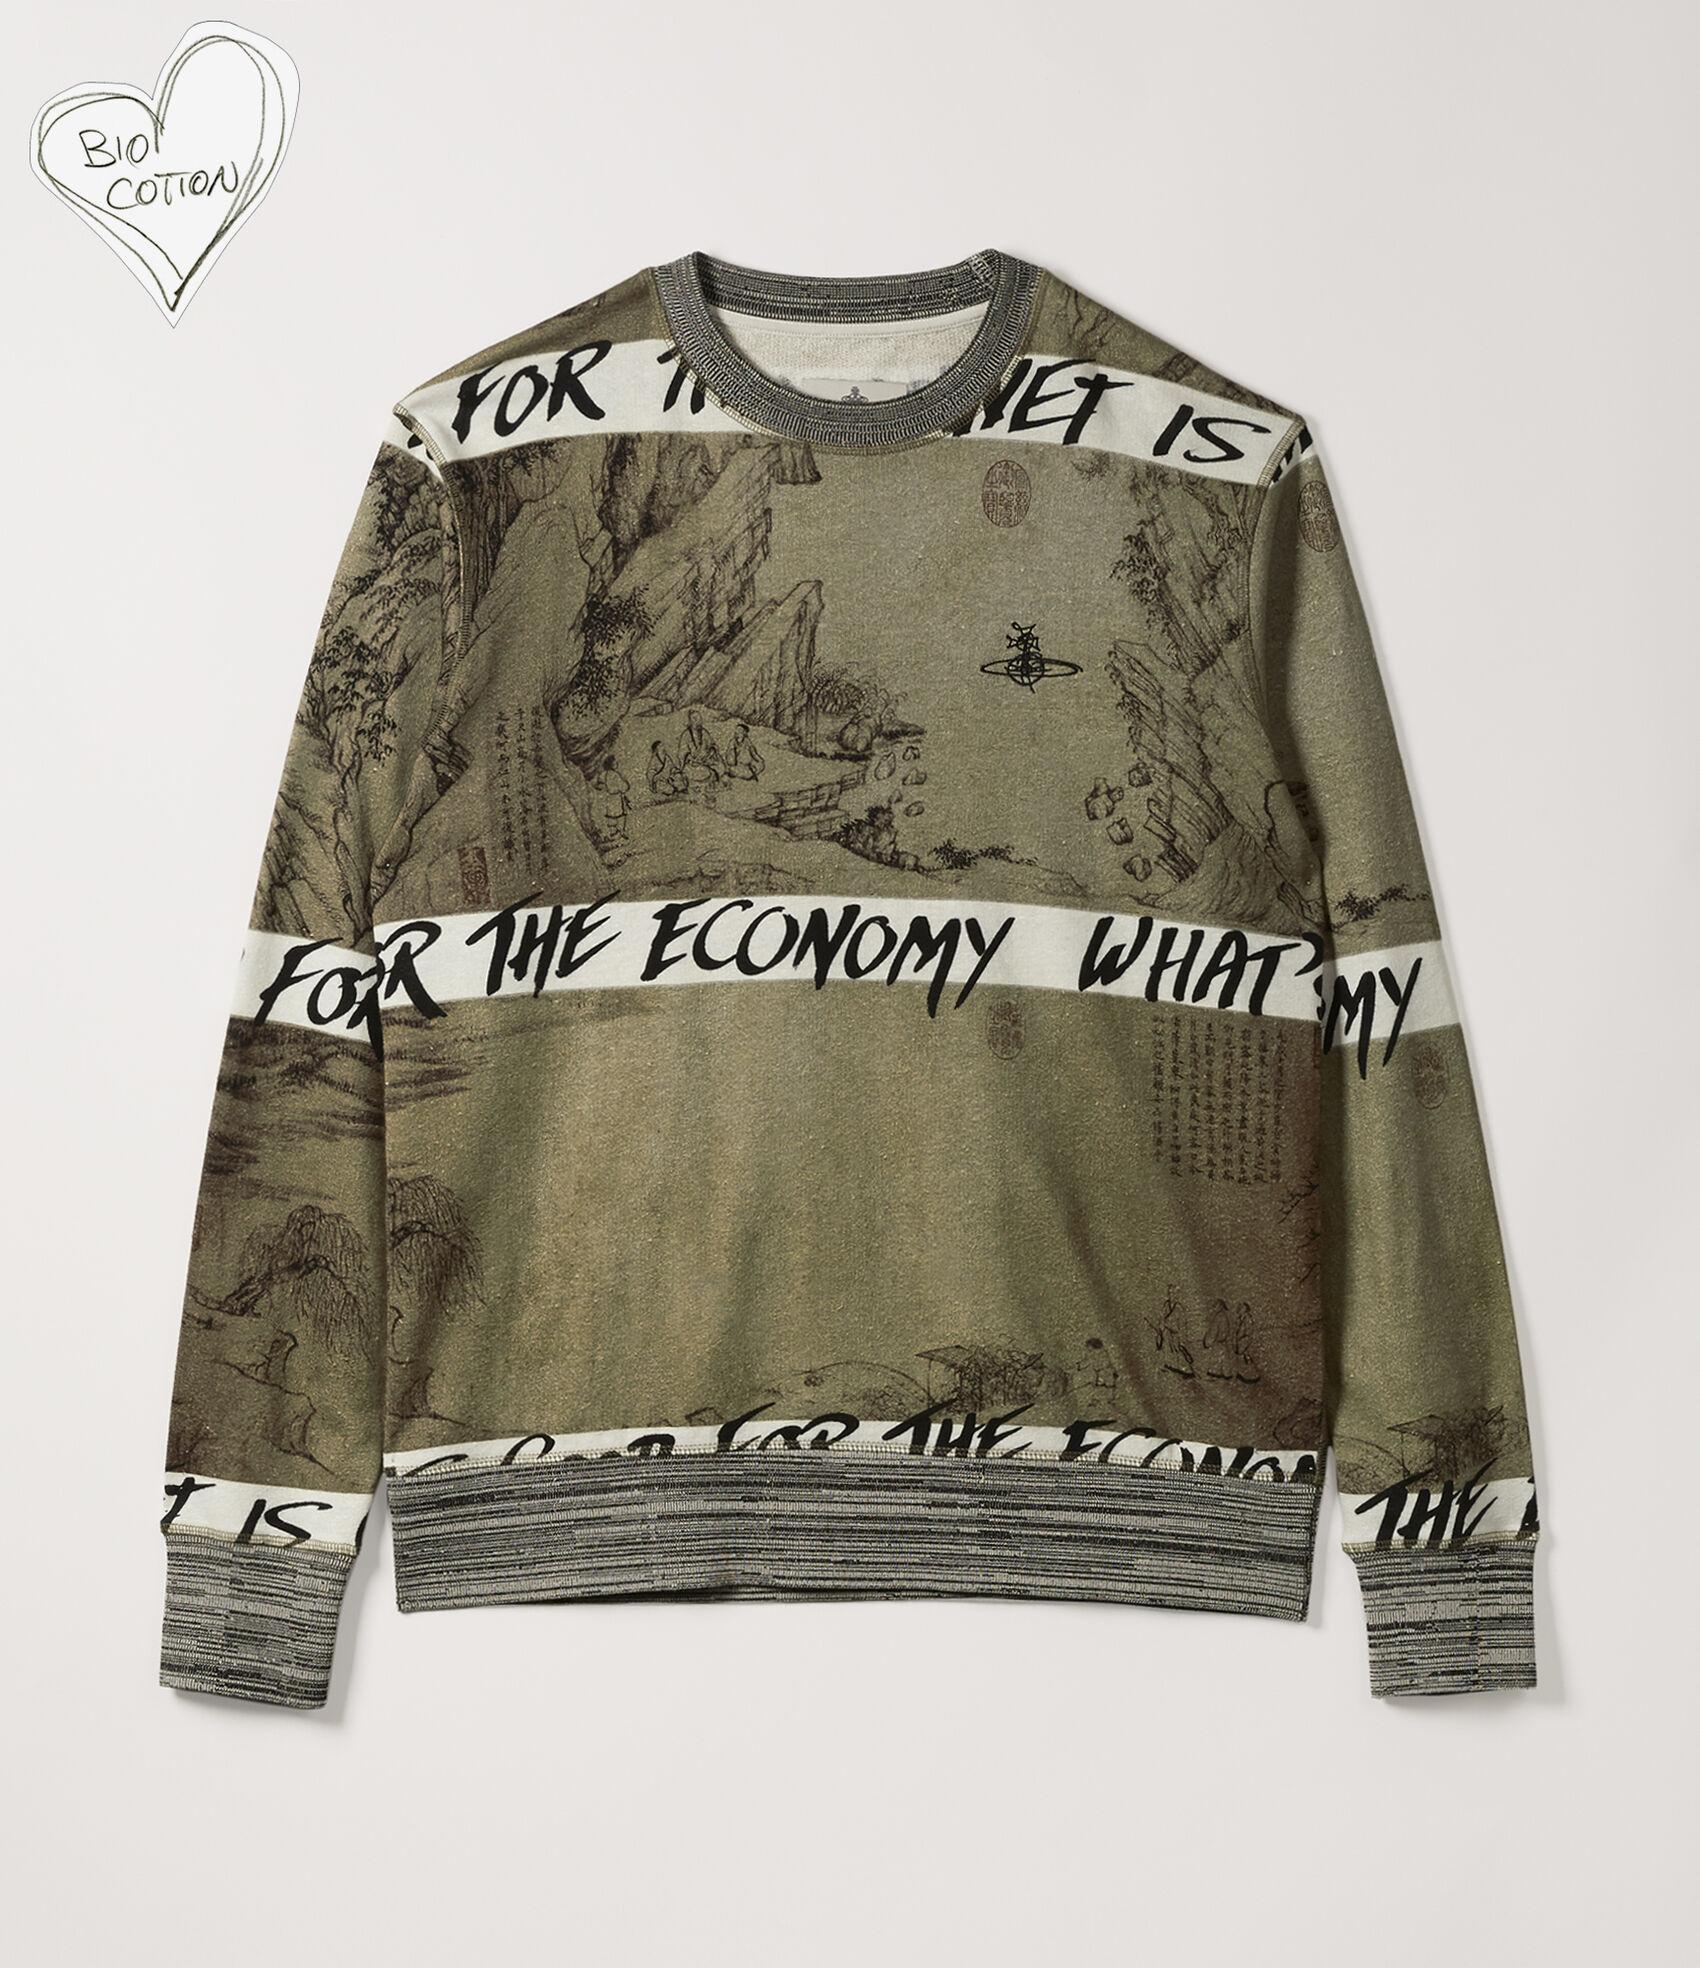 d4c58935ccf Vivienne Westwood Men's Designer Knitwear   Vivienne Westwood ...